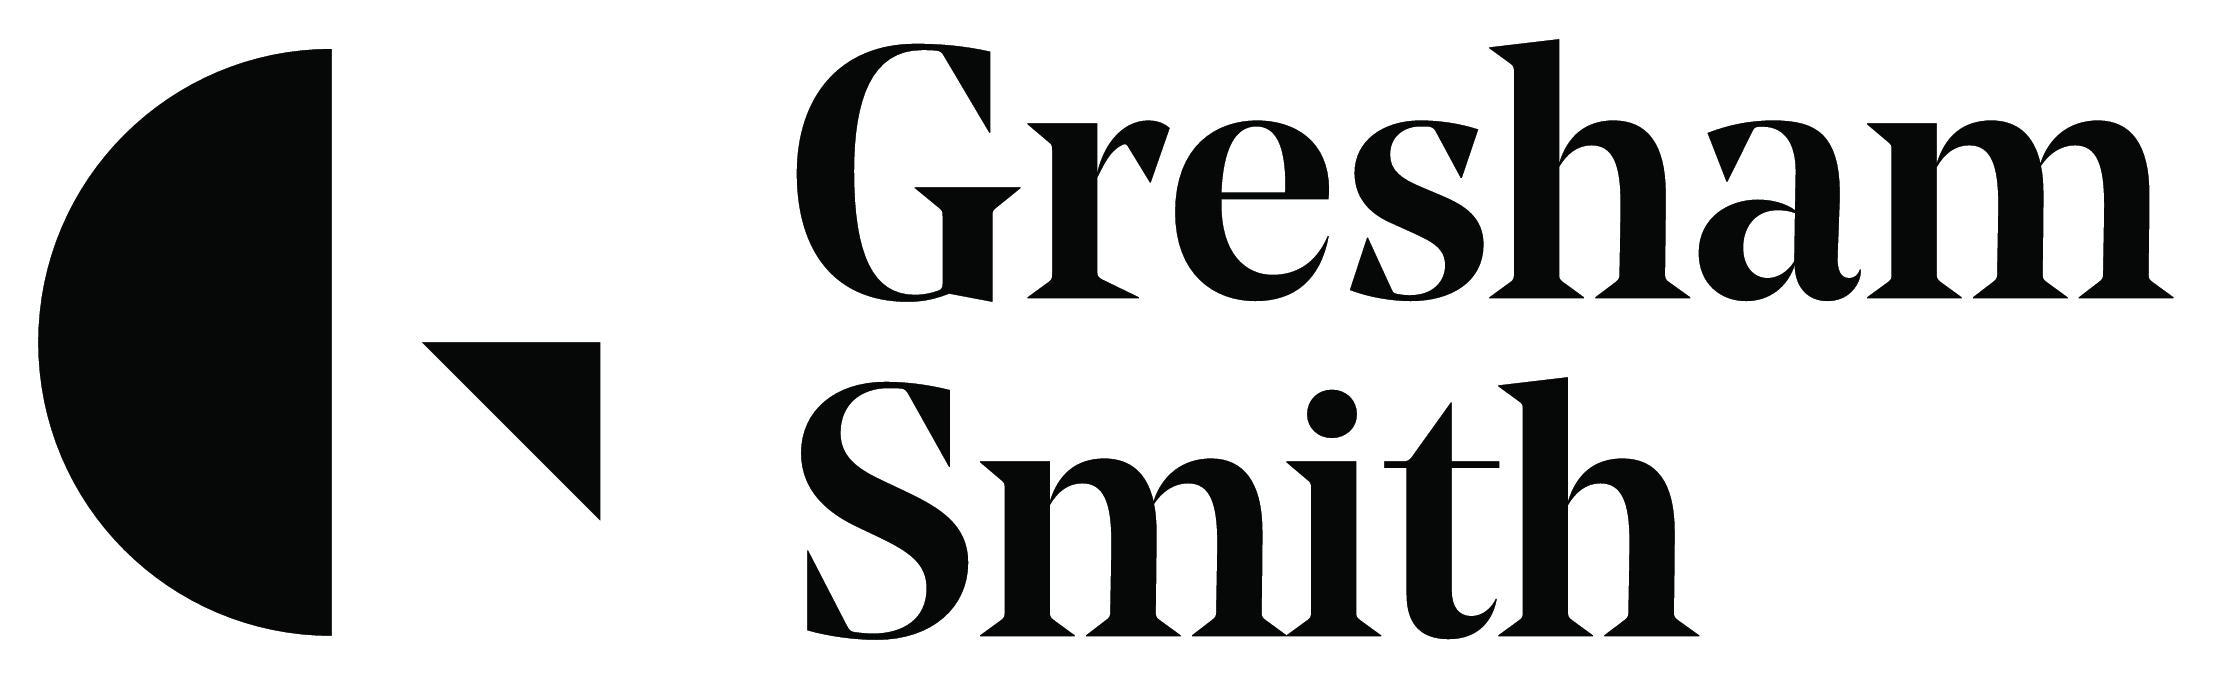 Gresham Smith | Nashville Area Chamber of Commerce